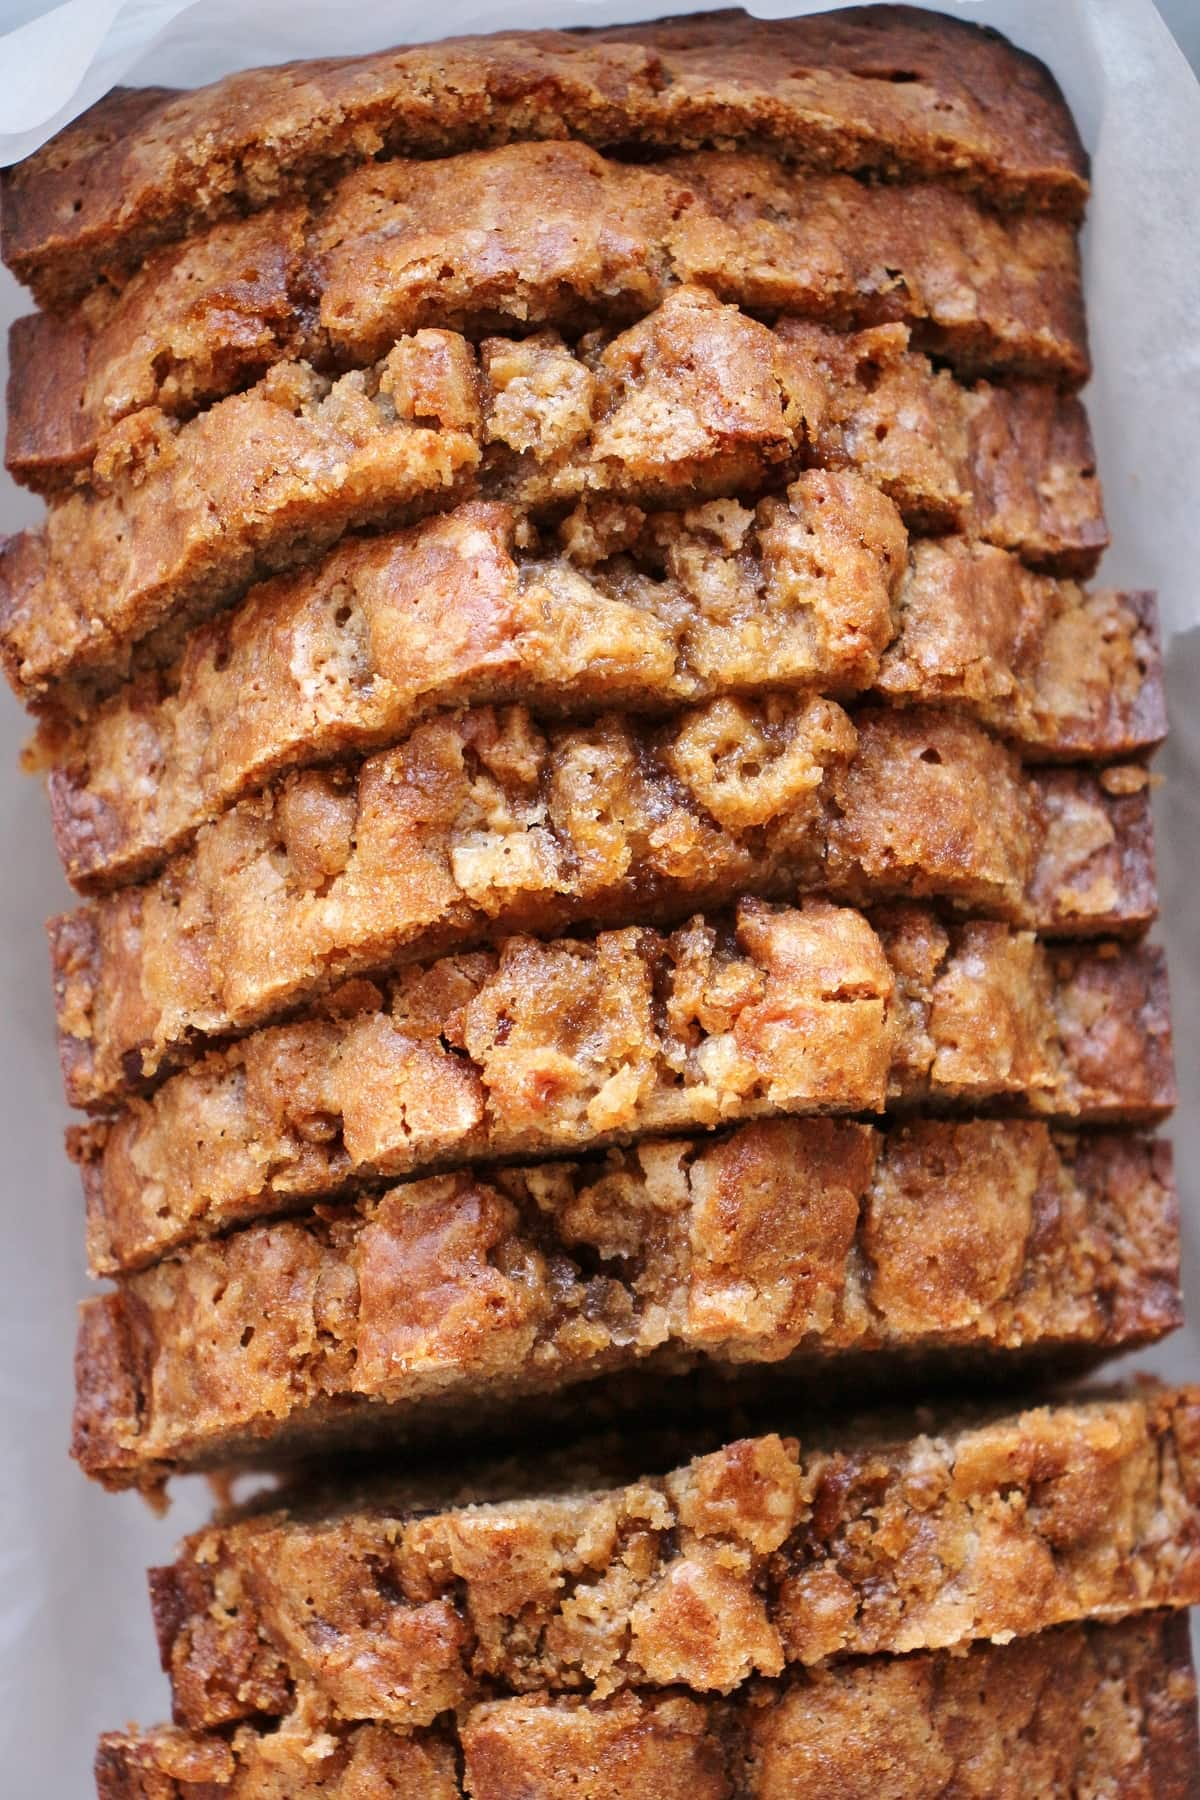 Closeup of a sliced loaf of banana bread.